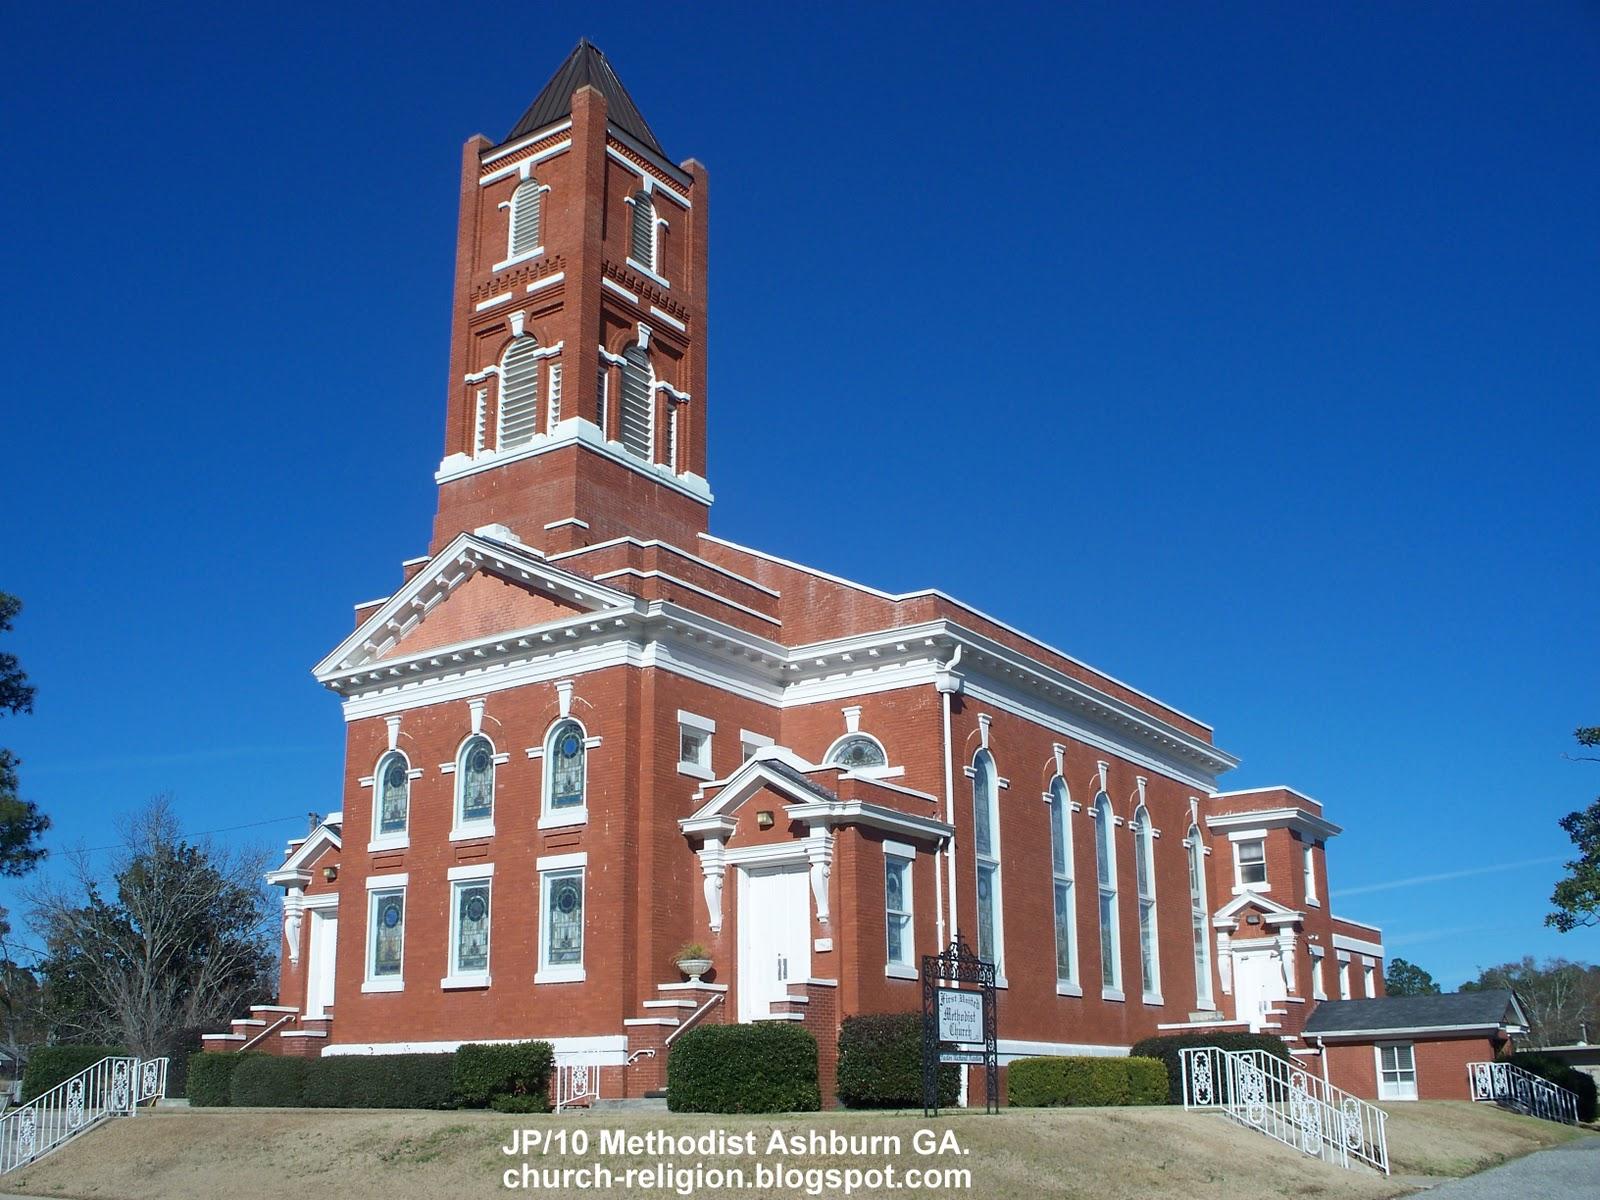 Methodist churches 2c first methodist church 2c ashburn georgia corner